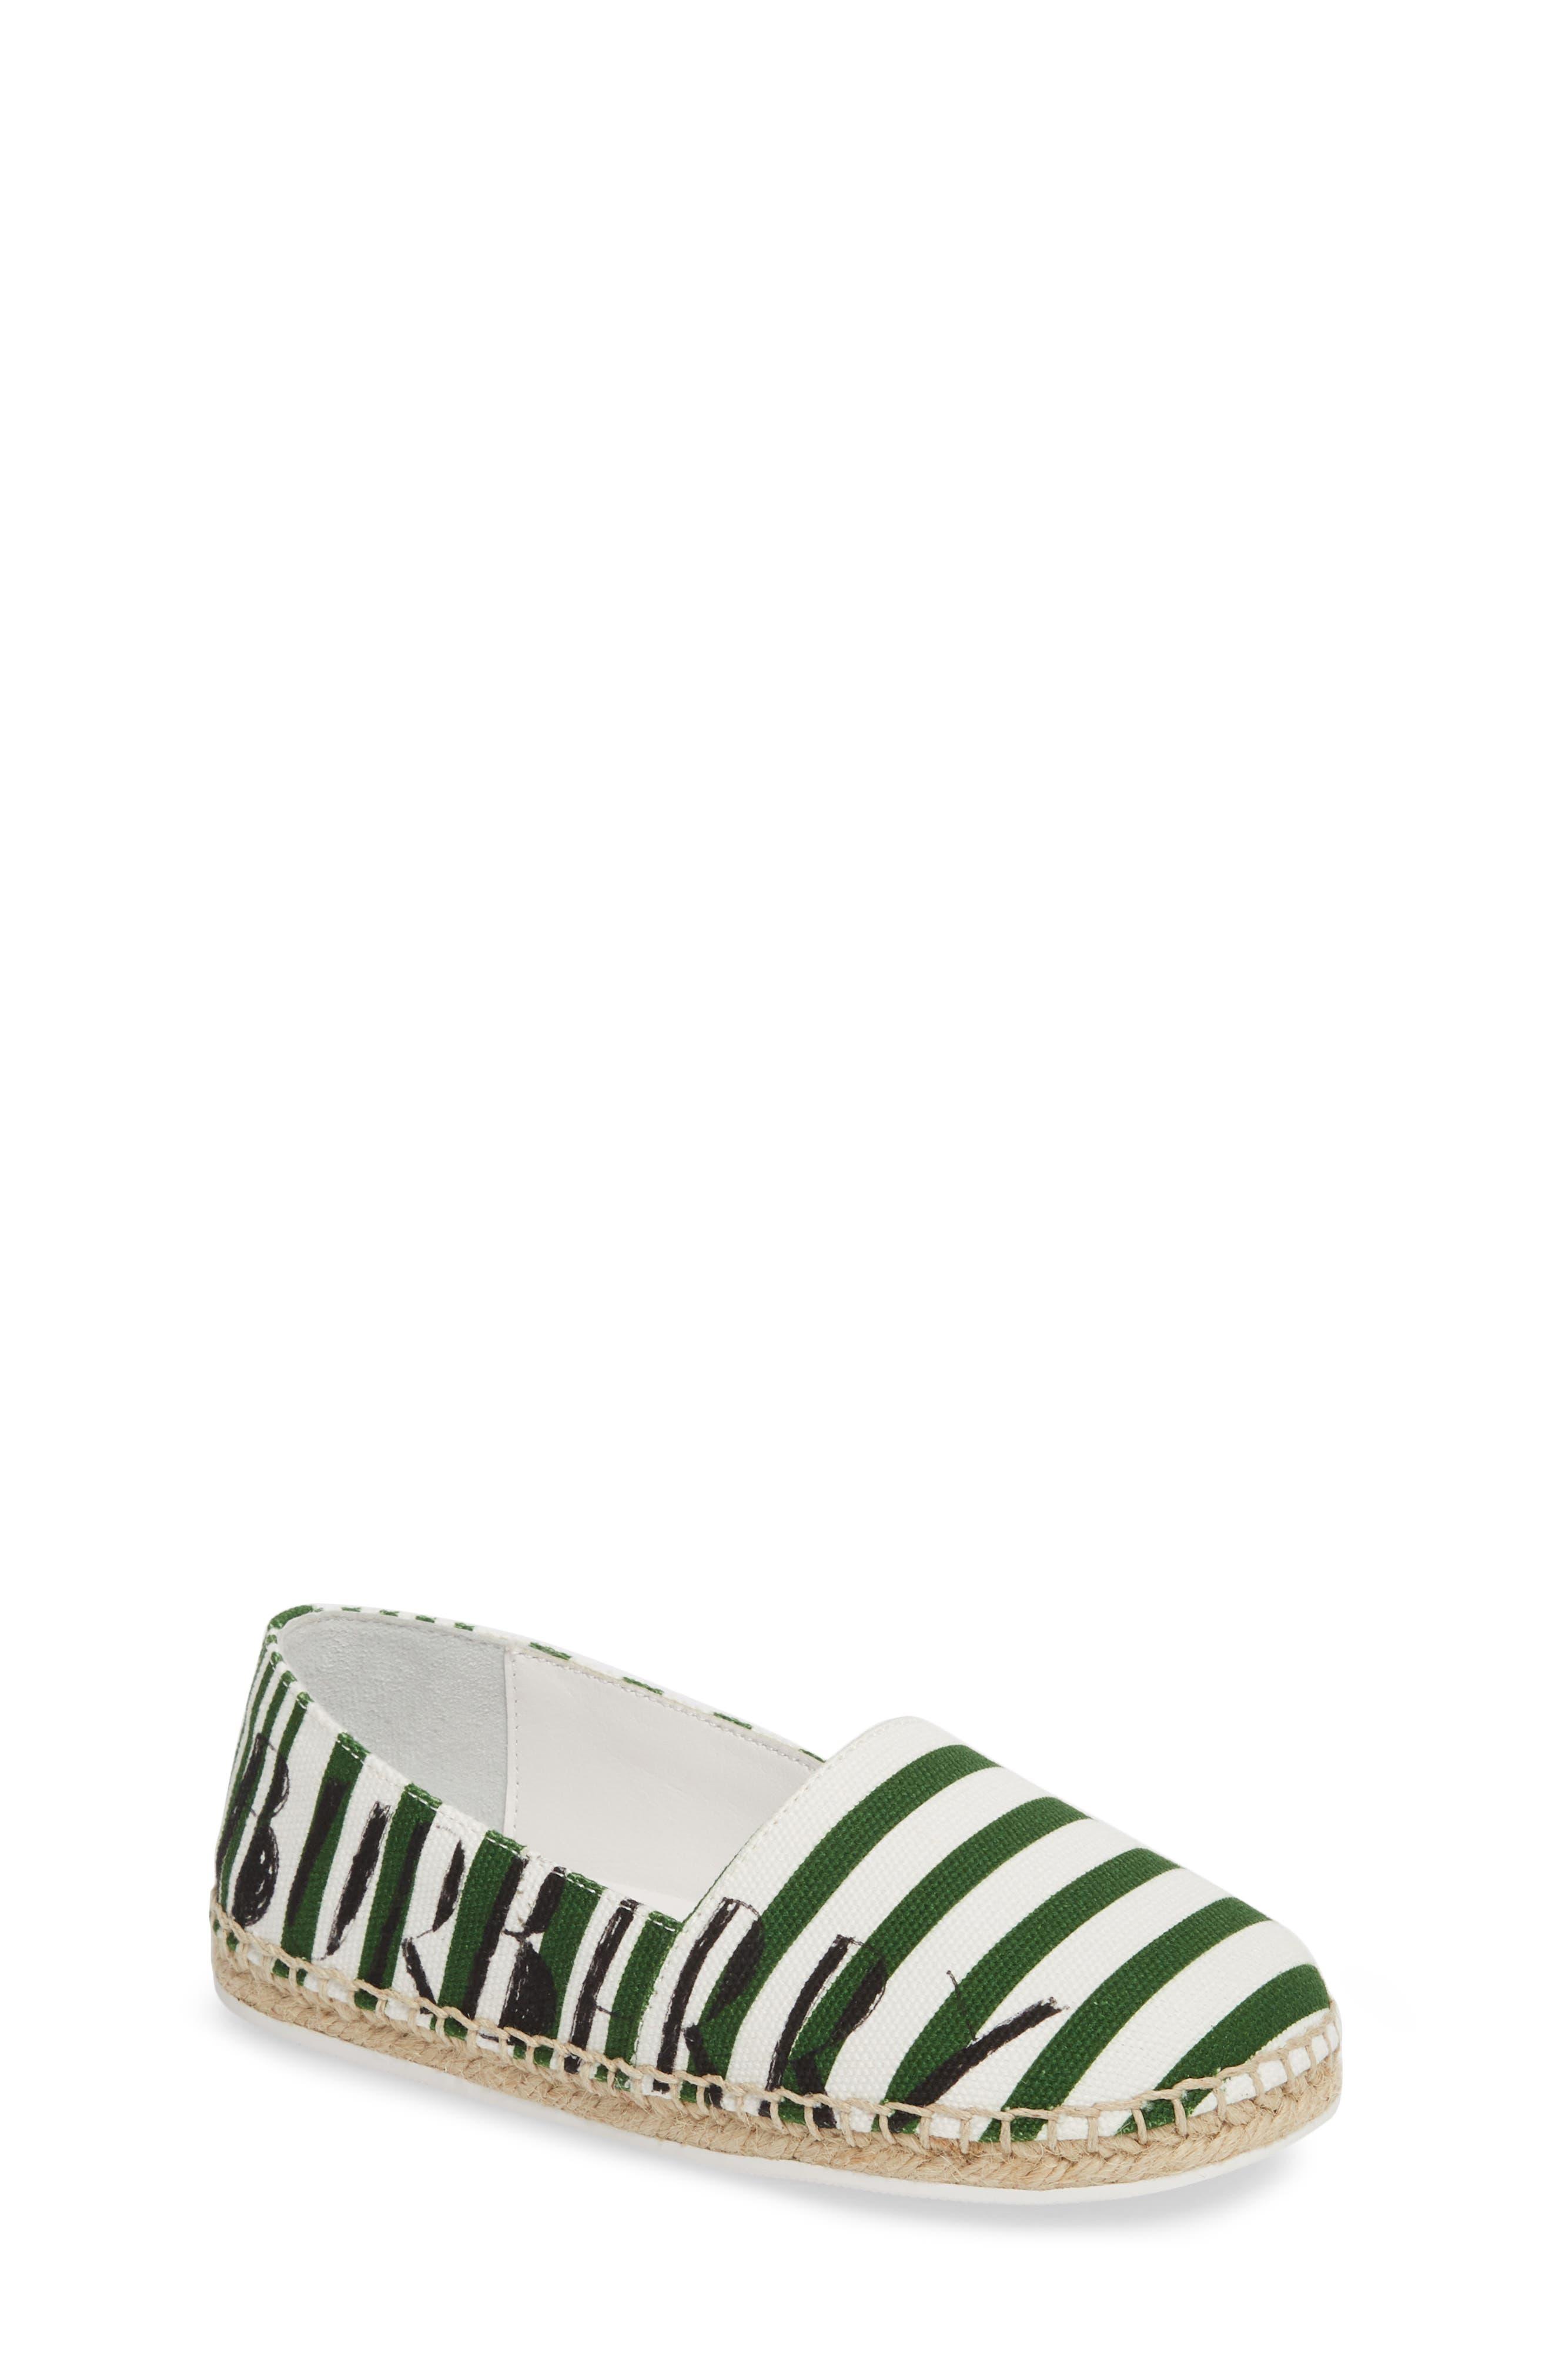 Peckfield Espadrille Slip-On,                         Main,                         color, BRIGHT FERN GREEN